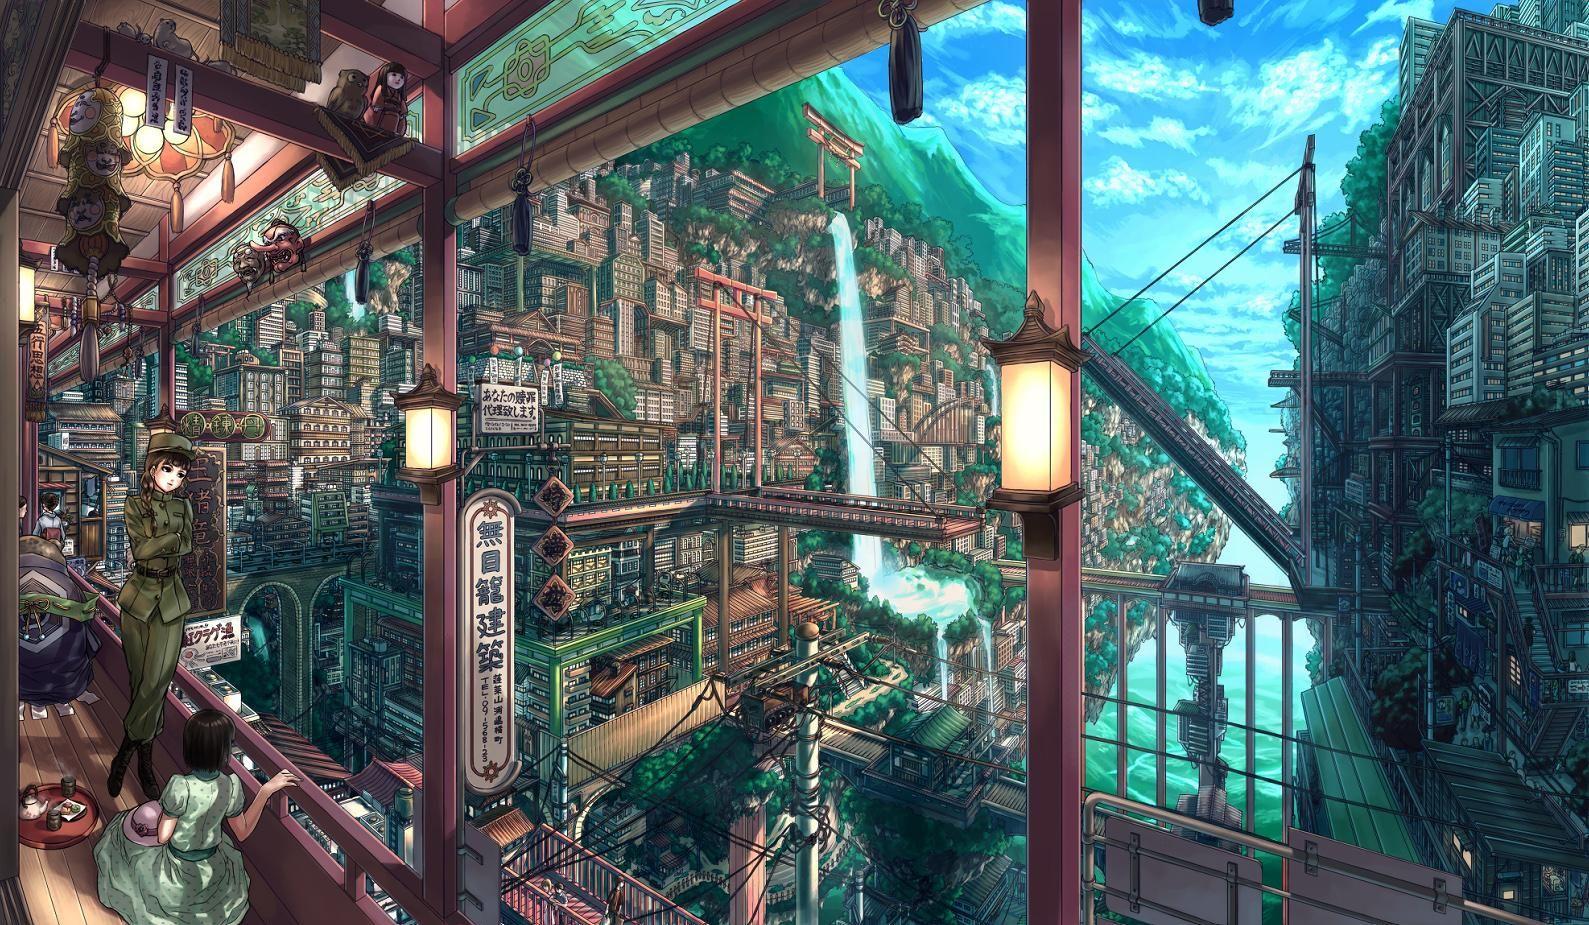 Beautiful Anime Wallpaper Anime Scenery Wallpaper Anime City